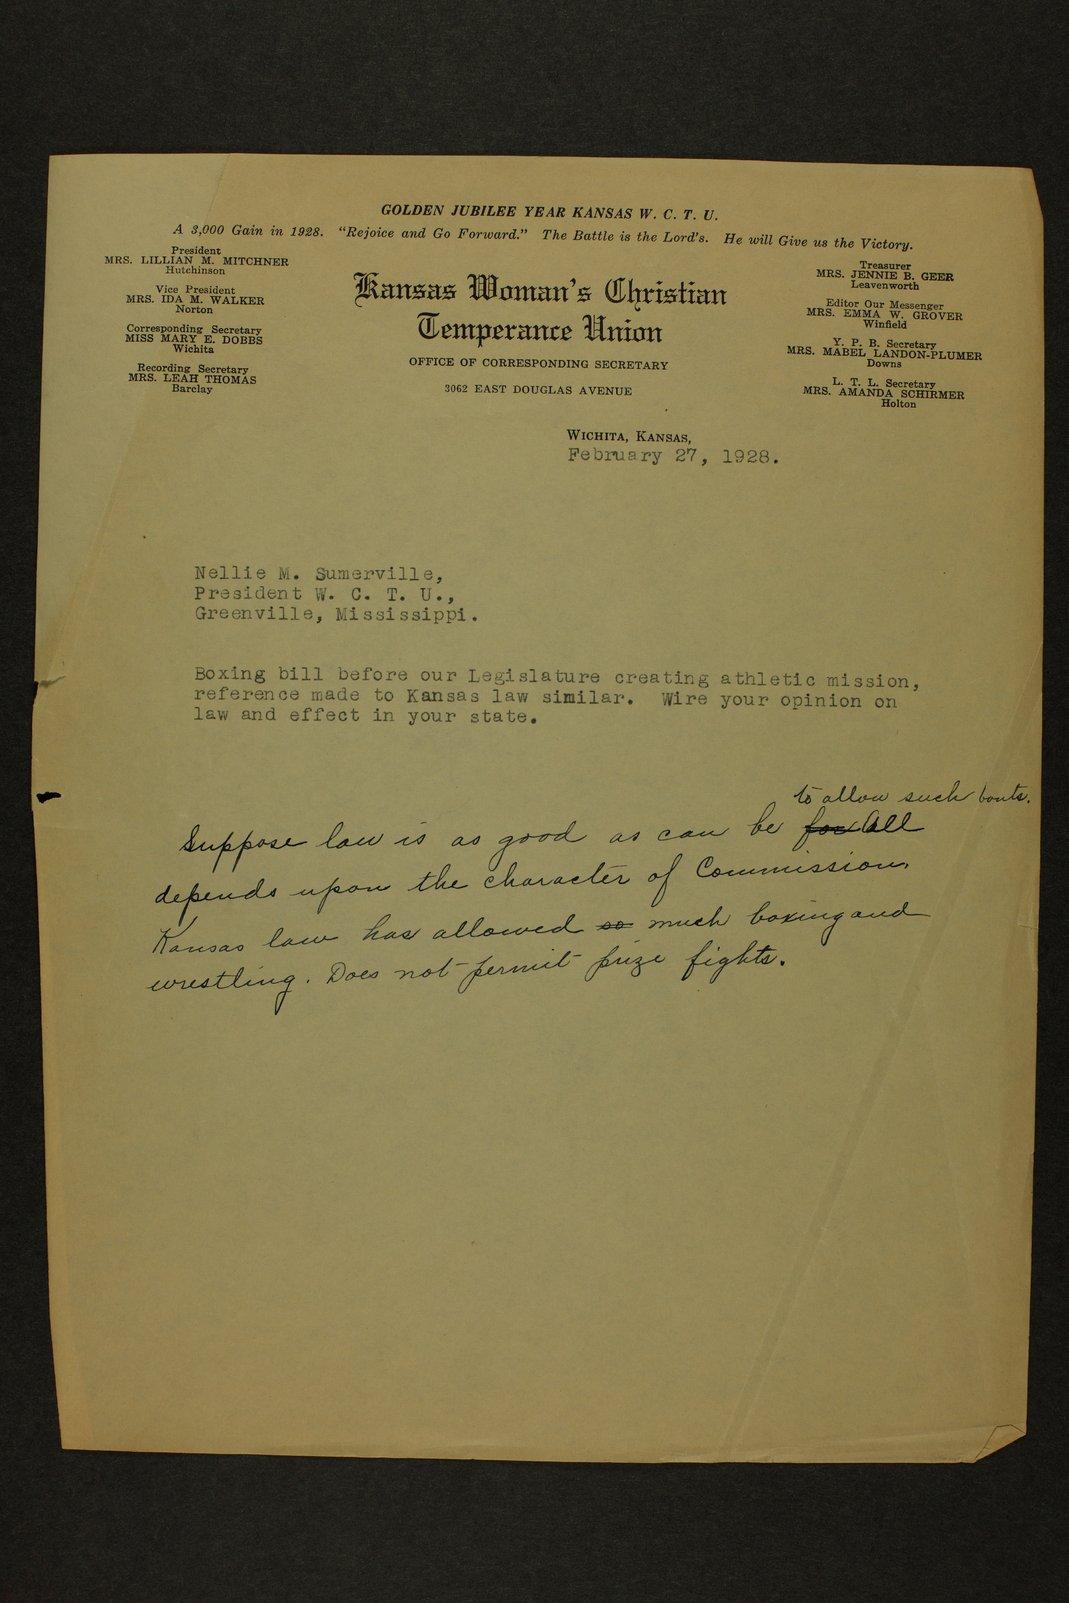 Kansas Woman's Christian Temperance Union permanent records - 45